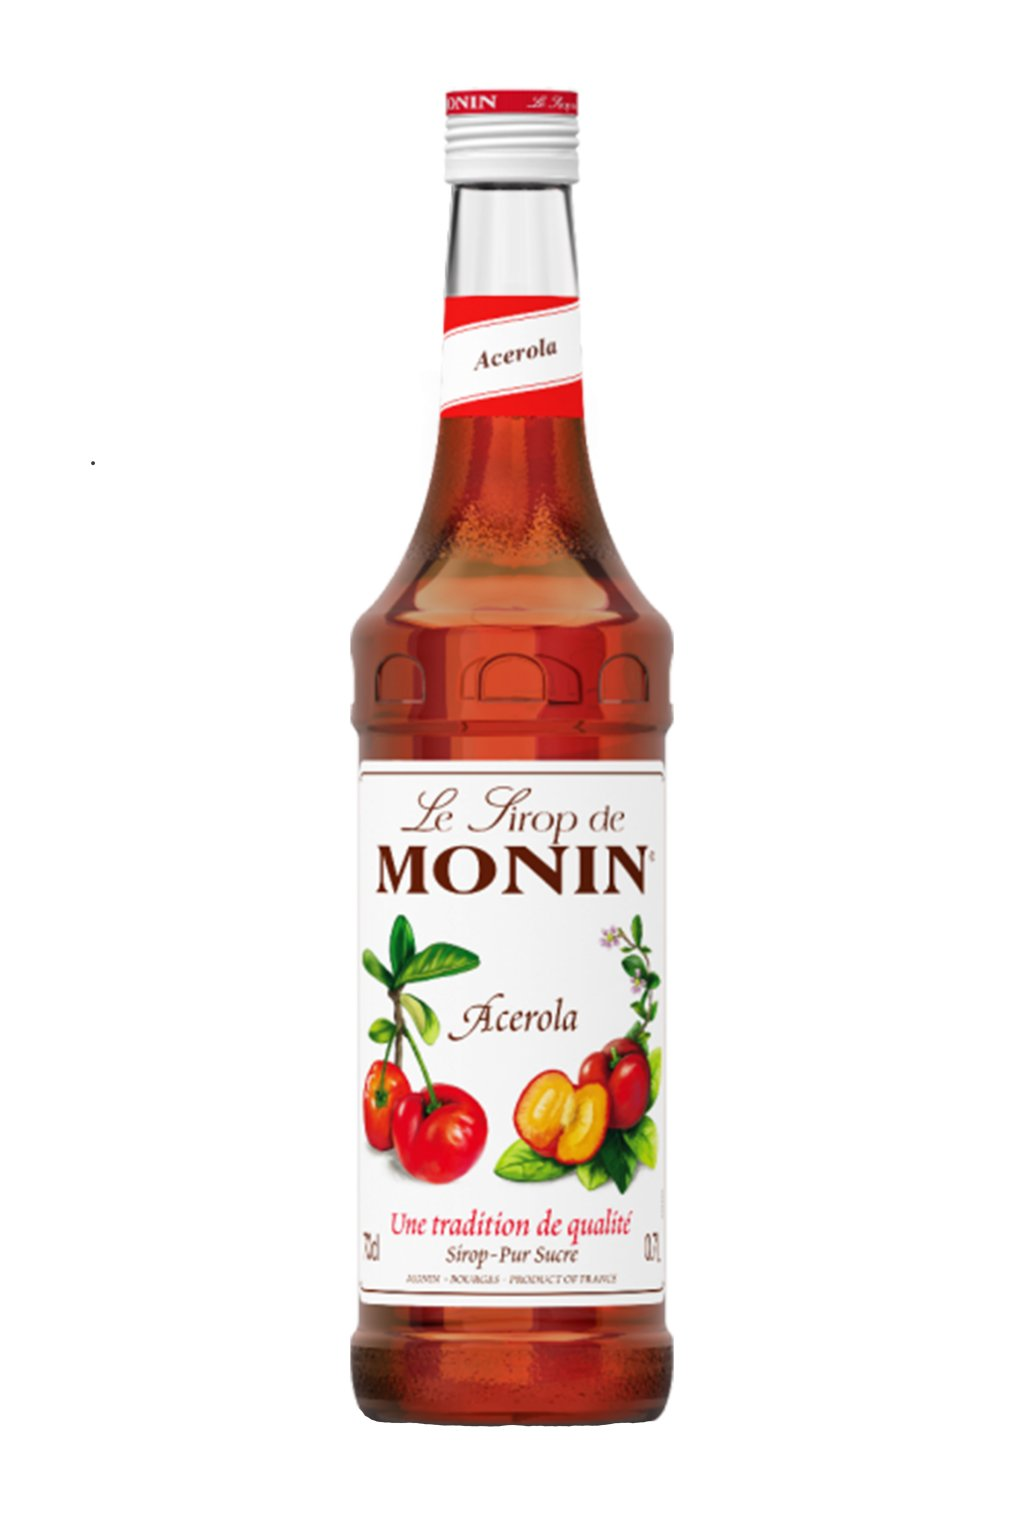 Monin Acerola